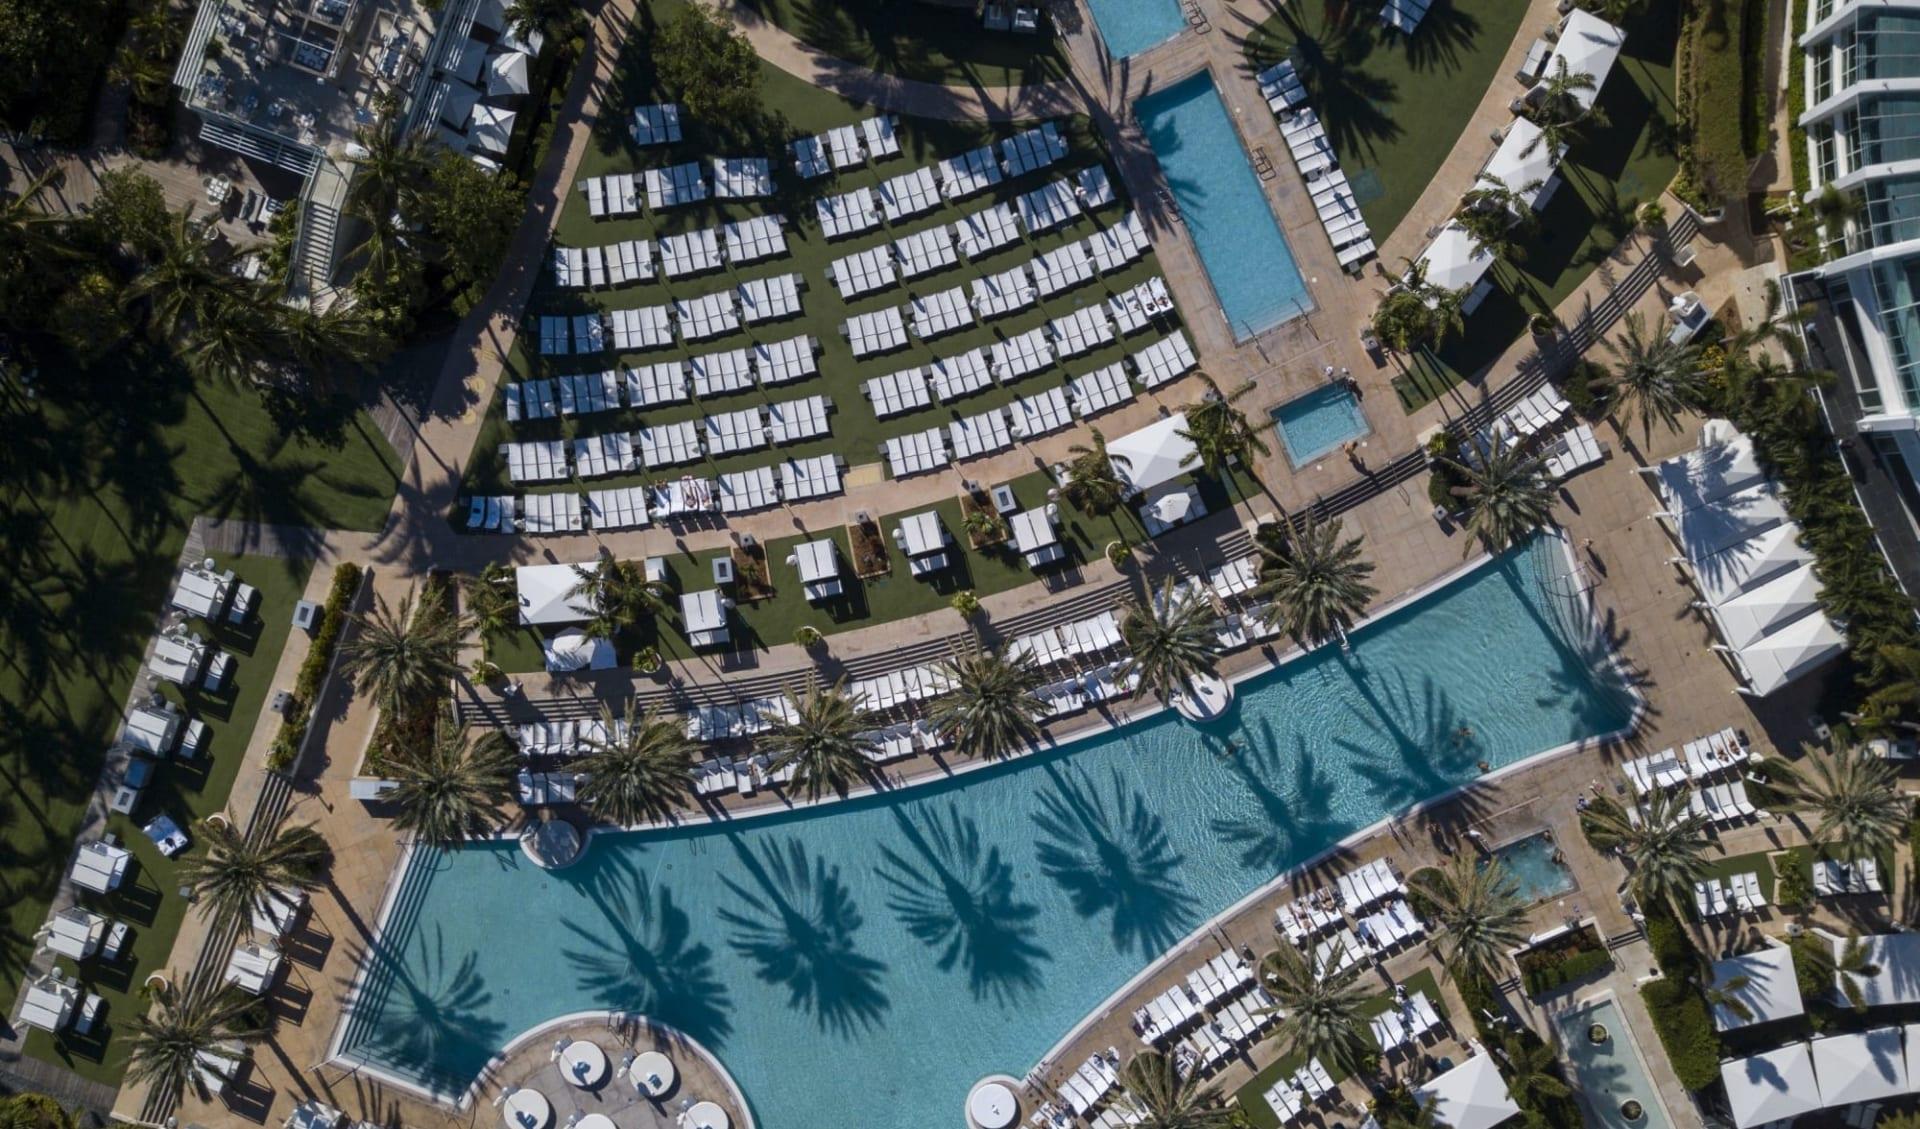 Fontainebleau Miami Beach: 004_BCV_Fontainebleau_Drone_by_brianadamsphoto.com